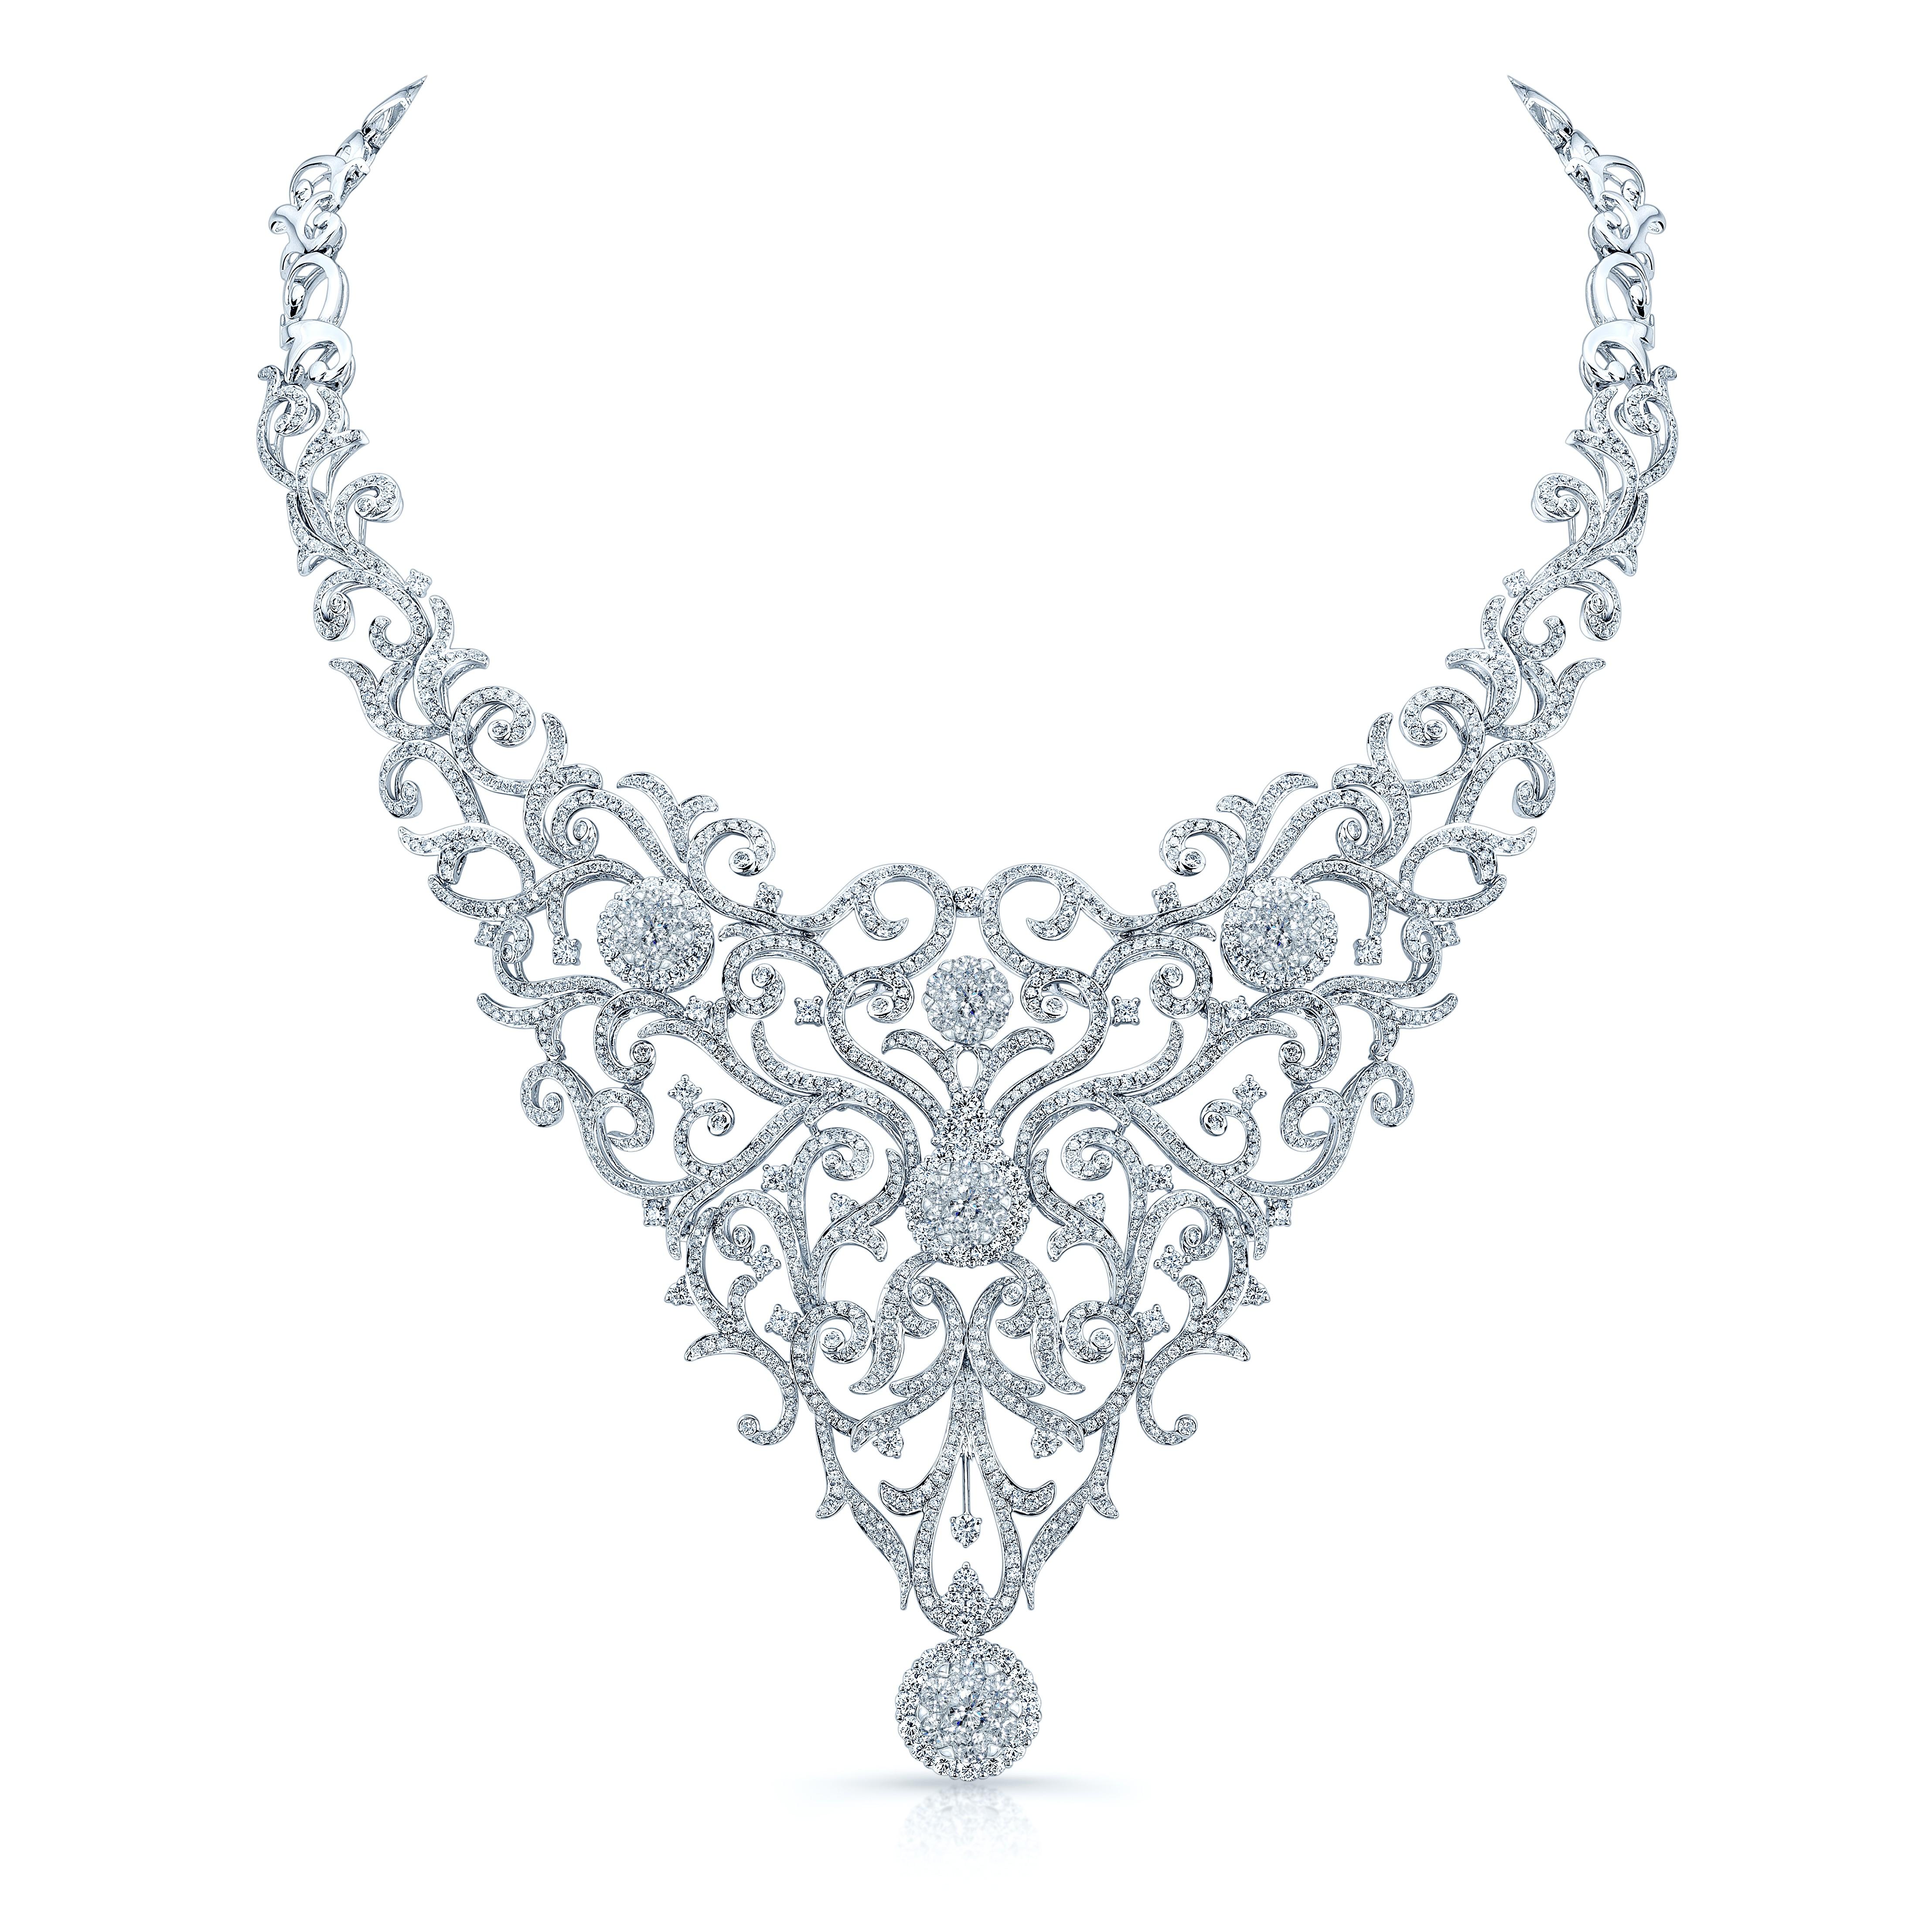 4431x4431 Round Cut Diamond Hekate Necklace 18k White Gold 20.50 Carat